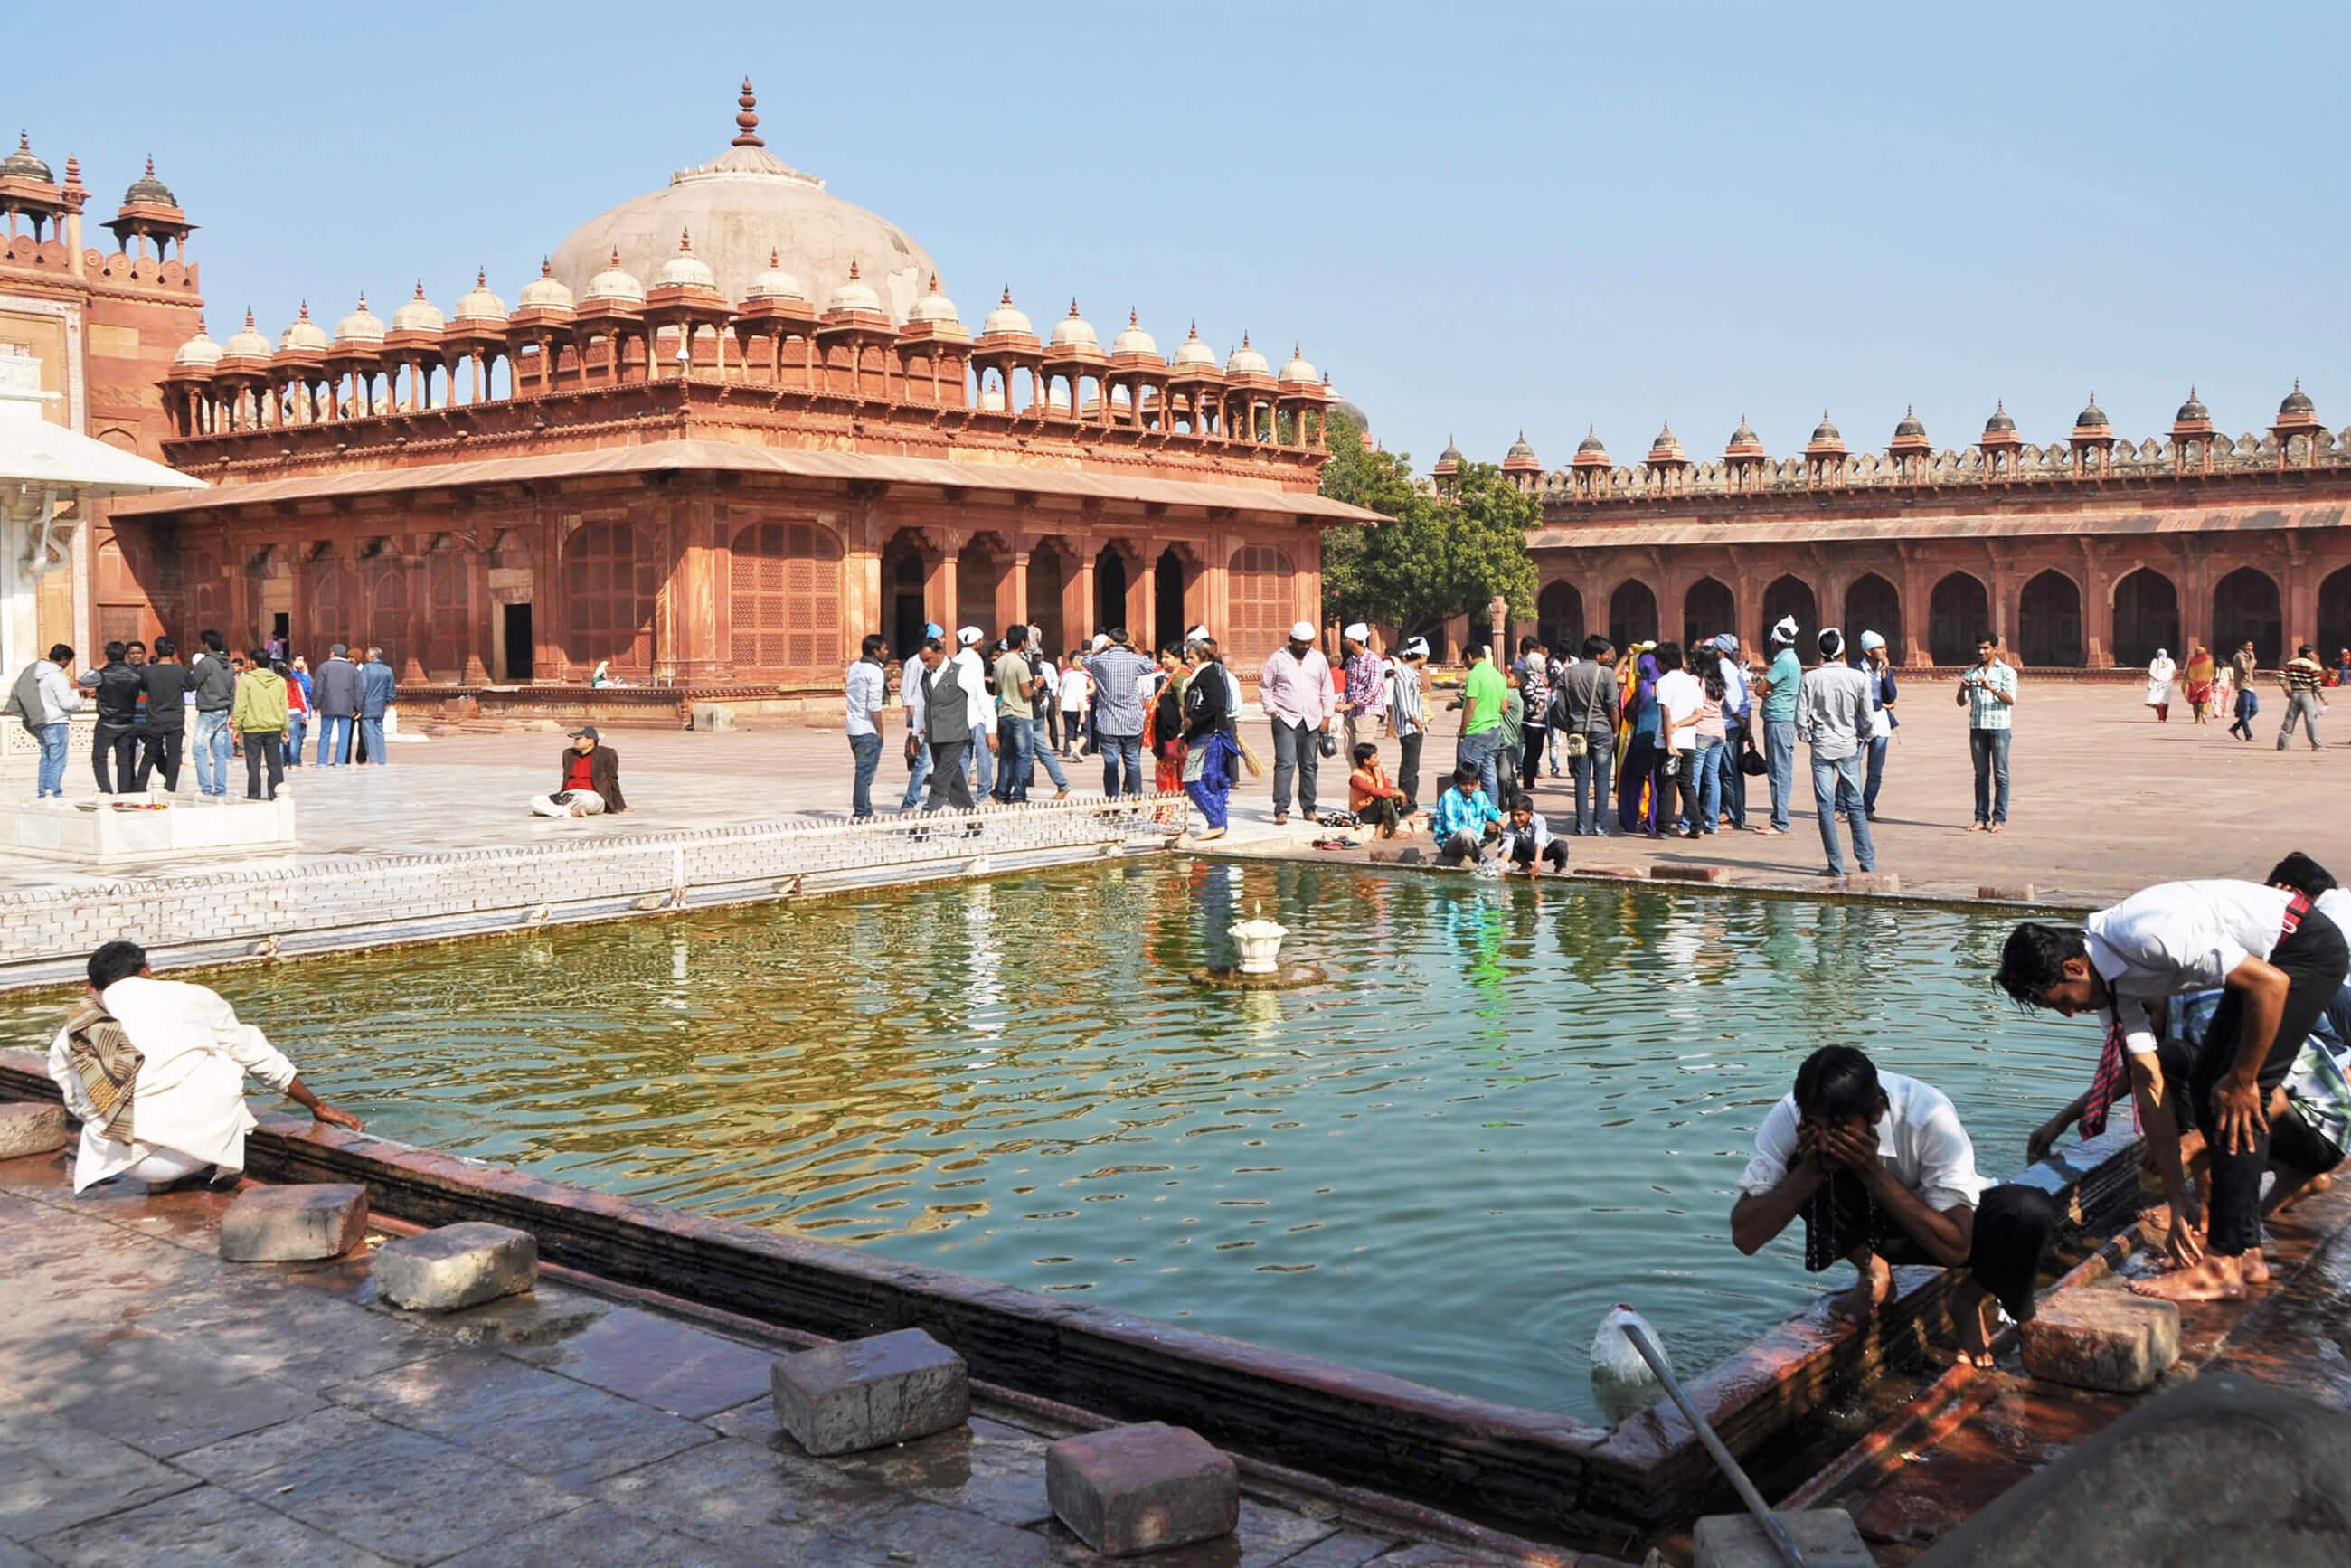 https://bubo.sk/uploads/galleries/16619/tomas-kubus_india_-fatehpur-sikri-1-.jpg